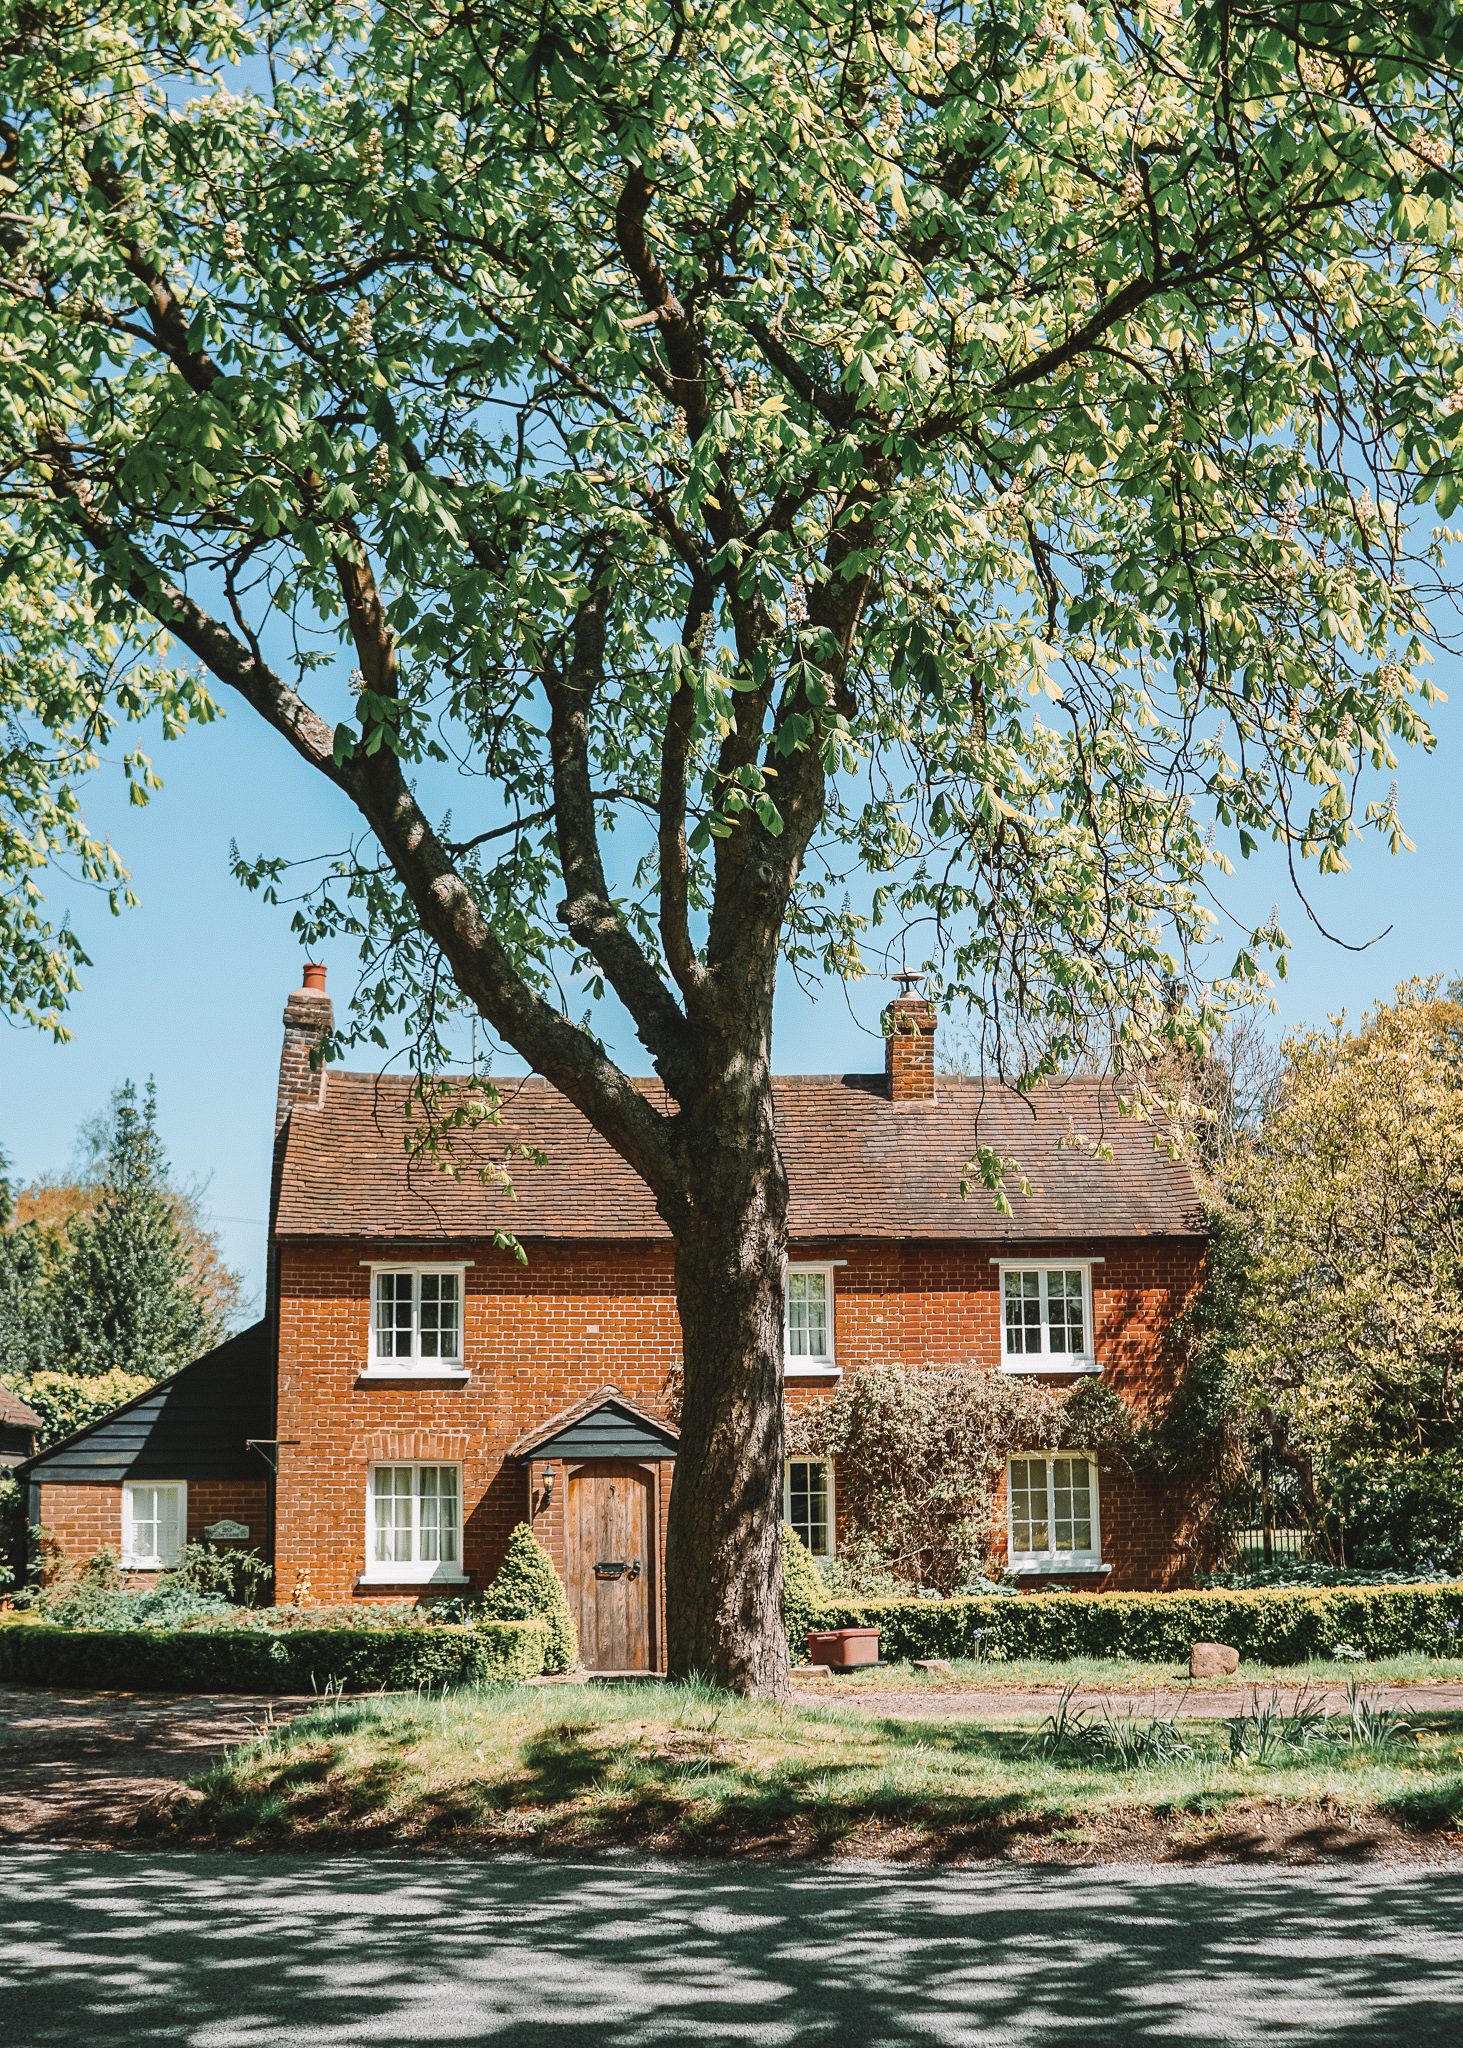 Ayot Green, Hertfordshire